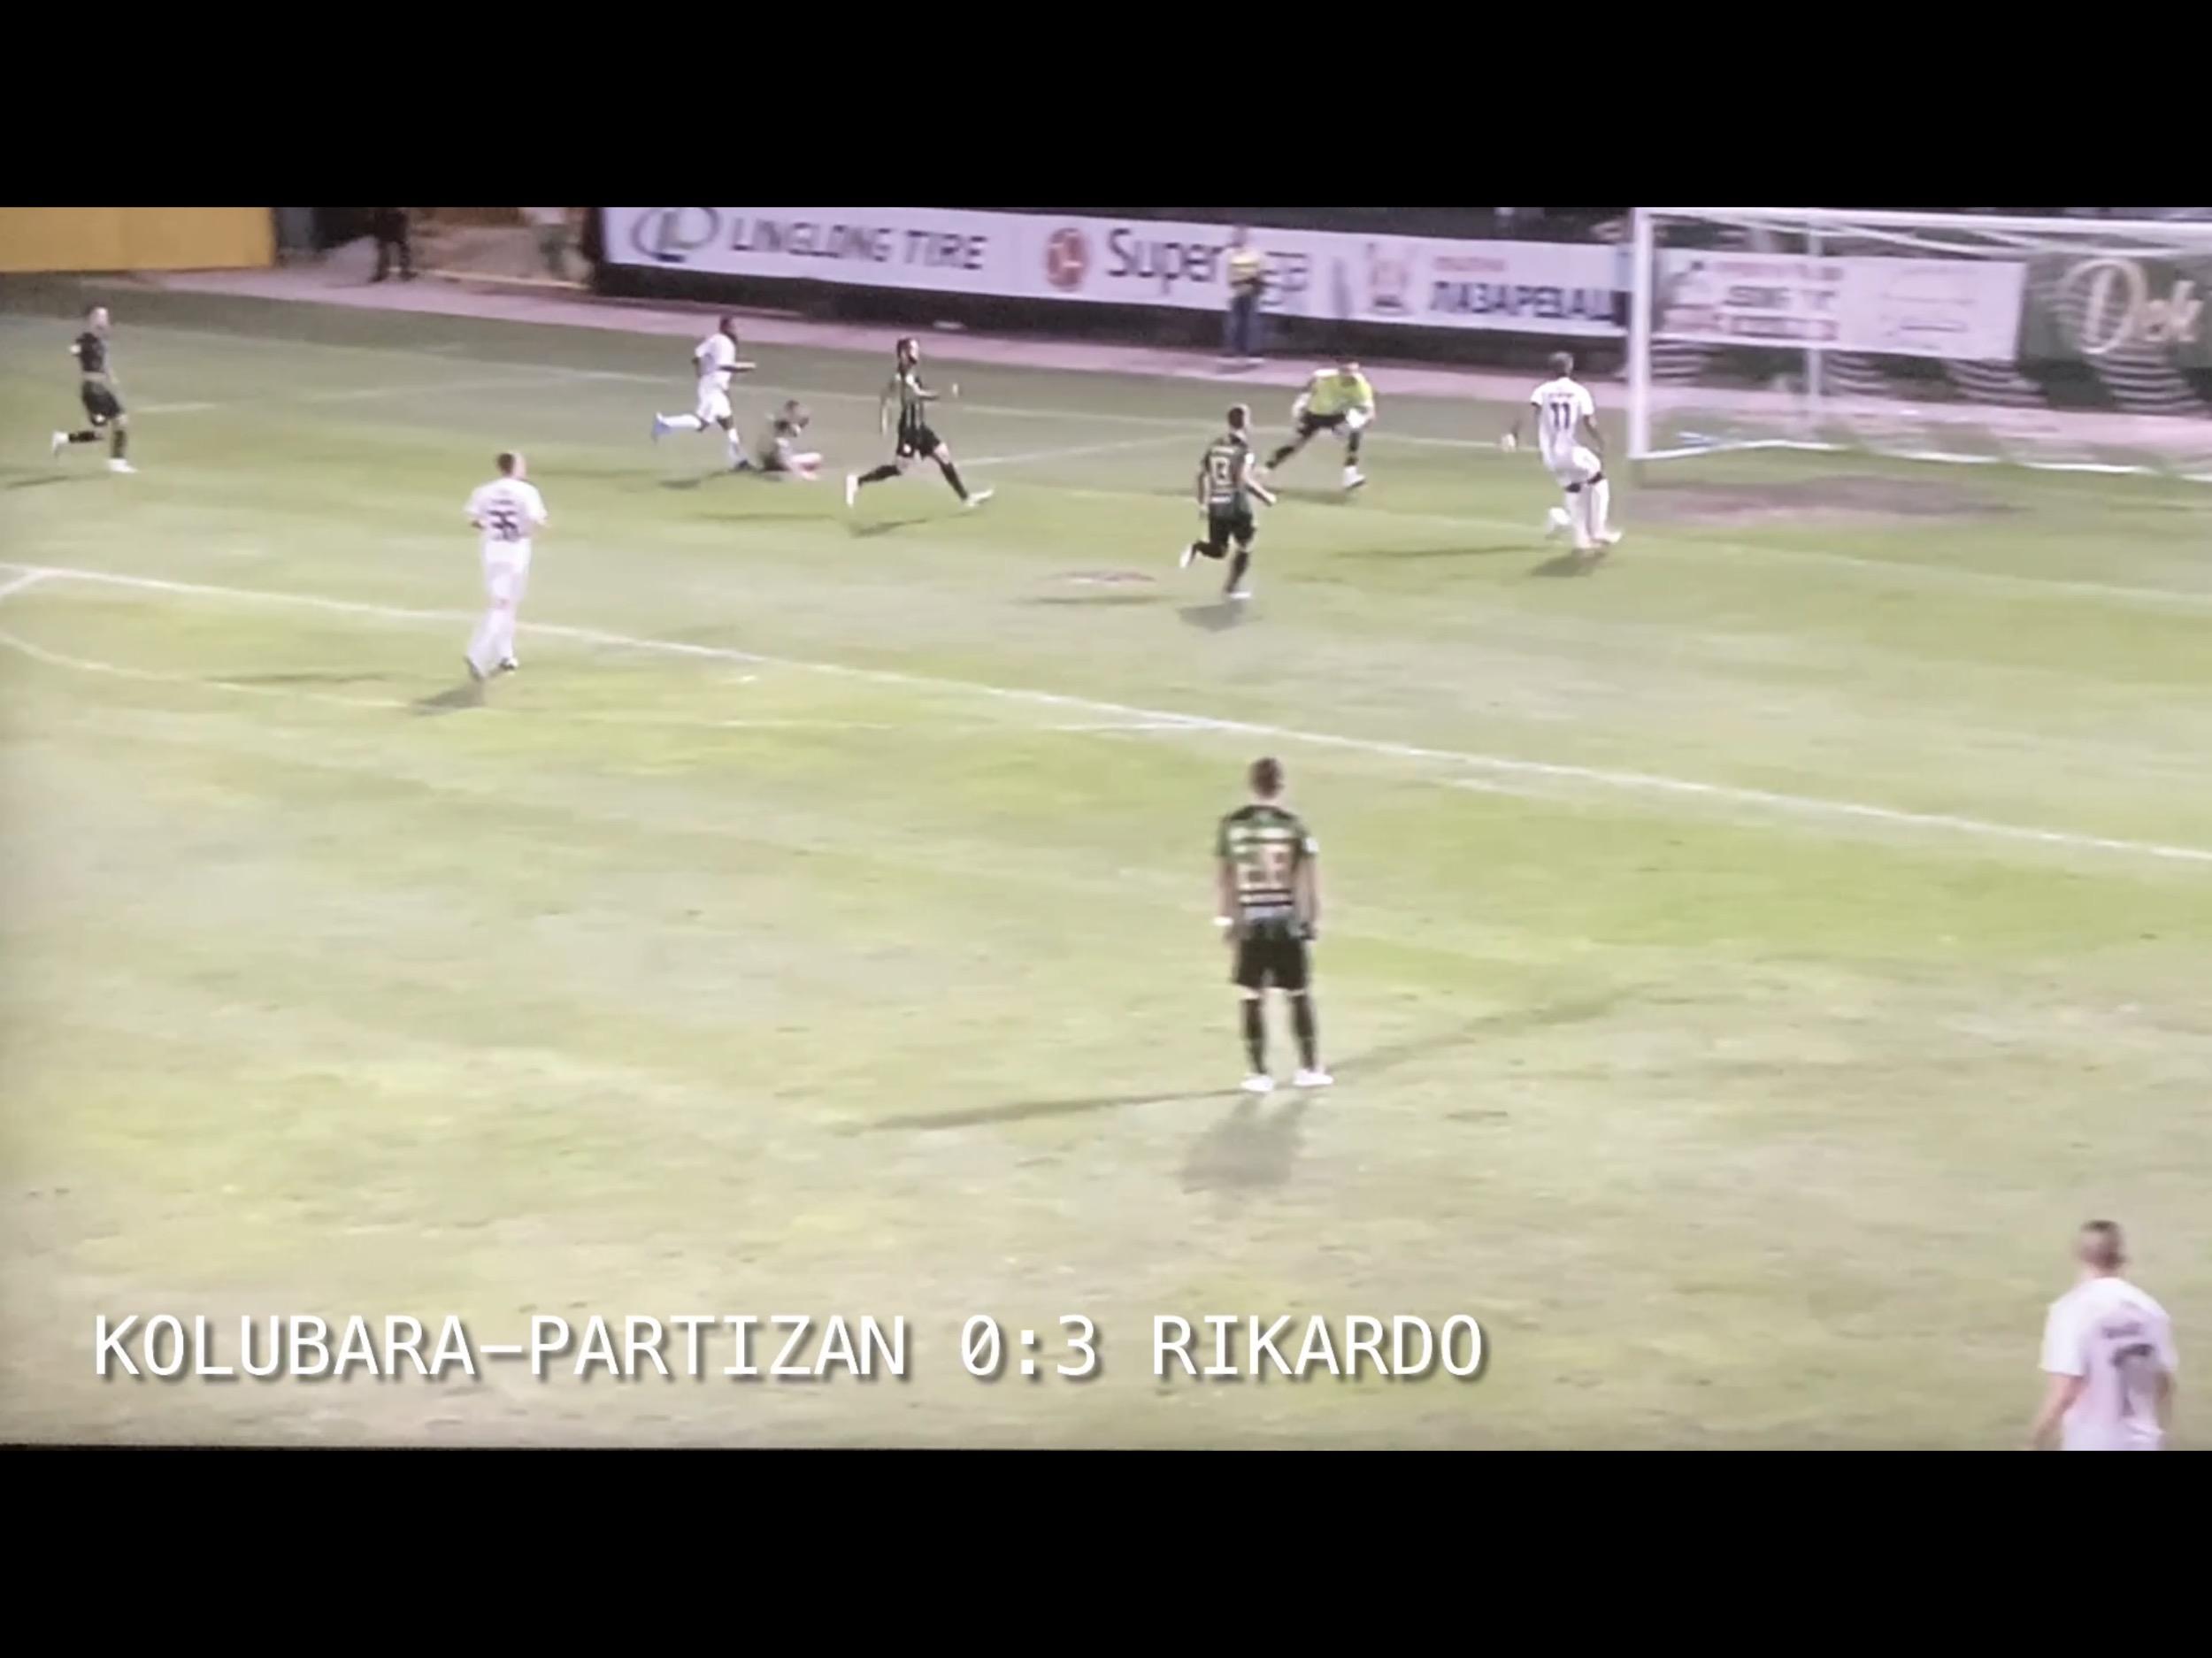 Izveštaj: Kolubara-Partizan 0:4. Umorni Partizan pregazio plitku Kolubaru…(VIDEO)